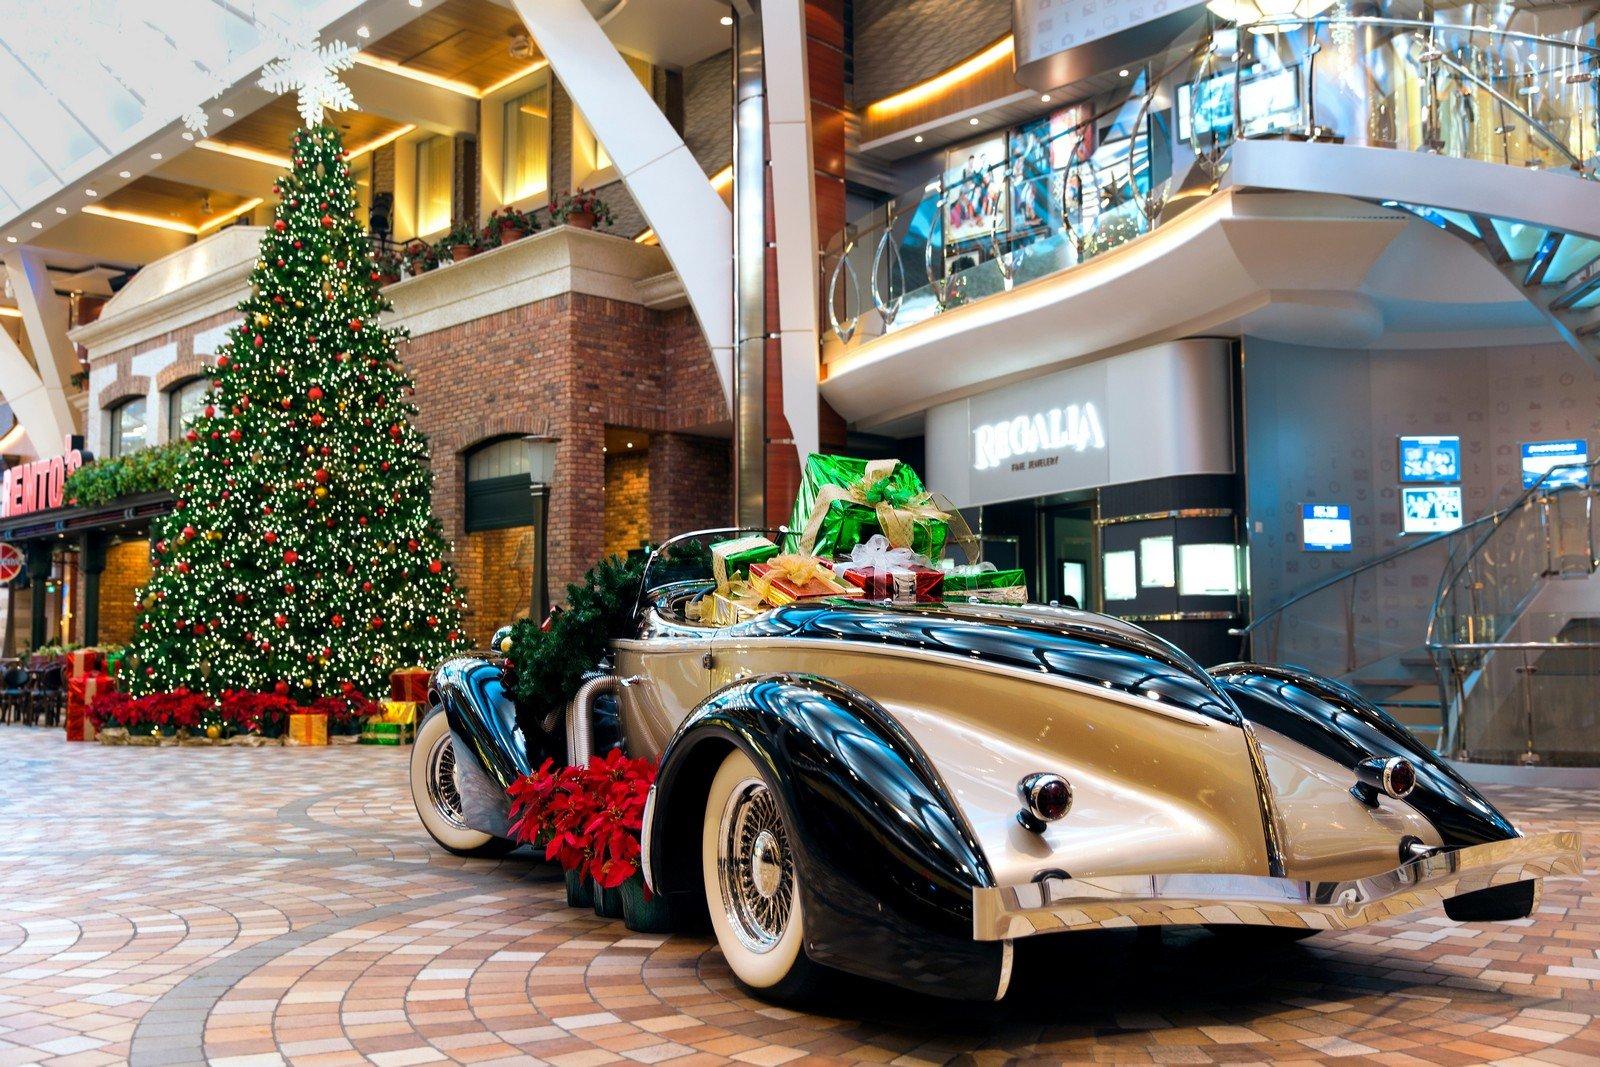 Royal Caribbean Cruise December 2021 Christmas How Royal Caribbean Celebrates Christmas And New Years Holidays On Its Cruise Ships Royal Caribbean Blog